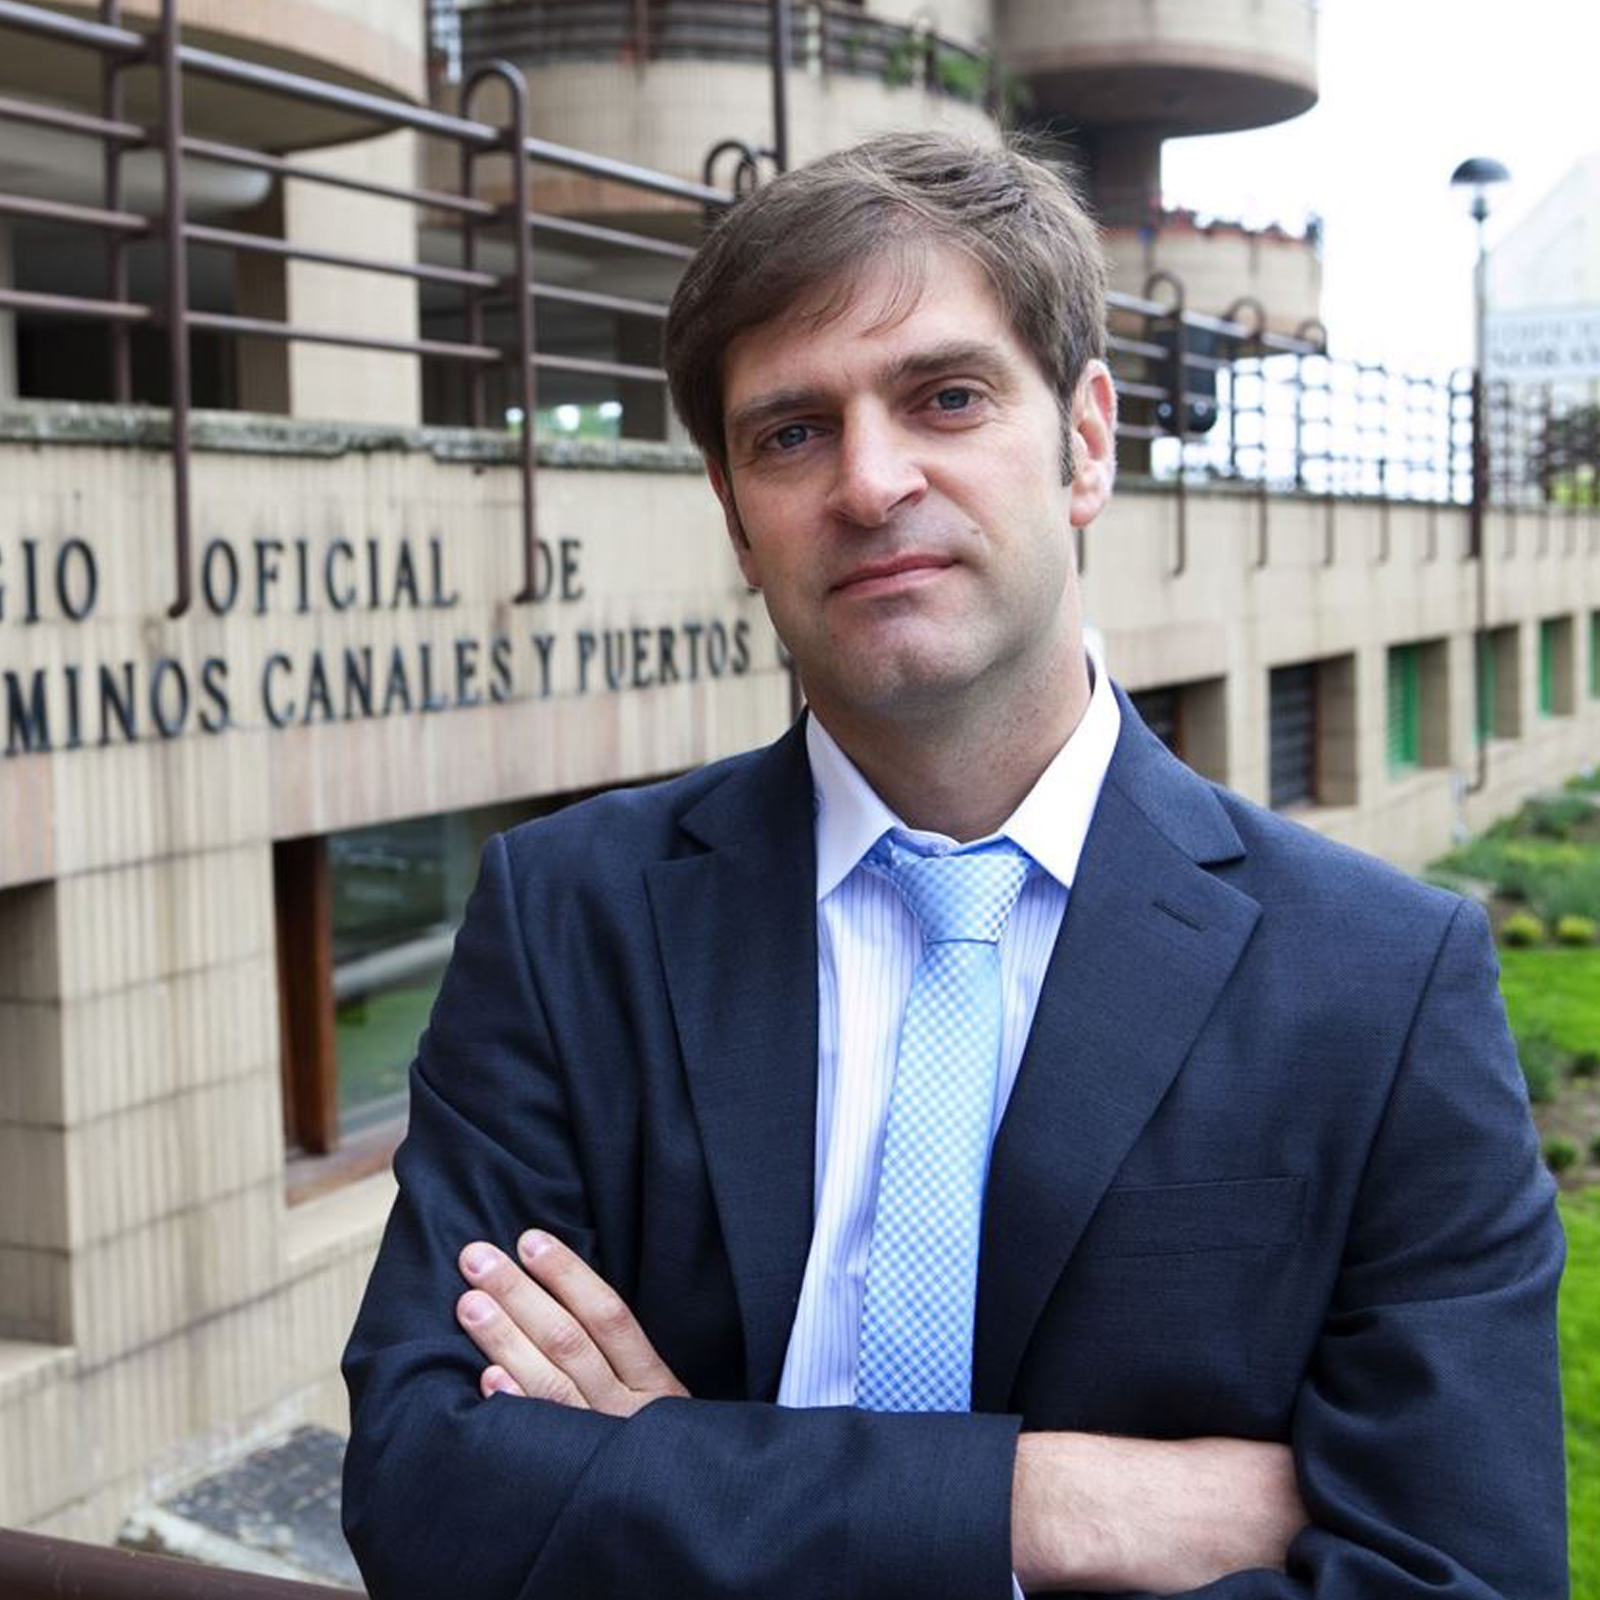 JD_presidente